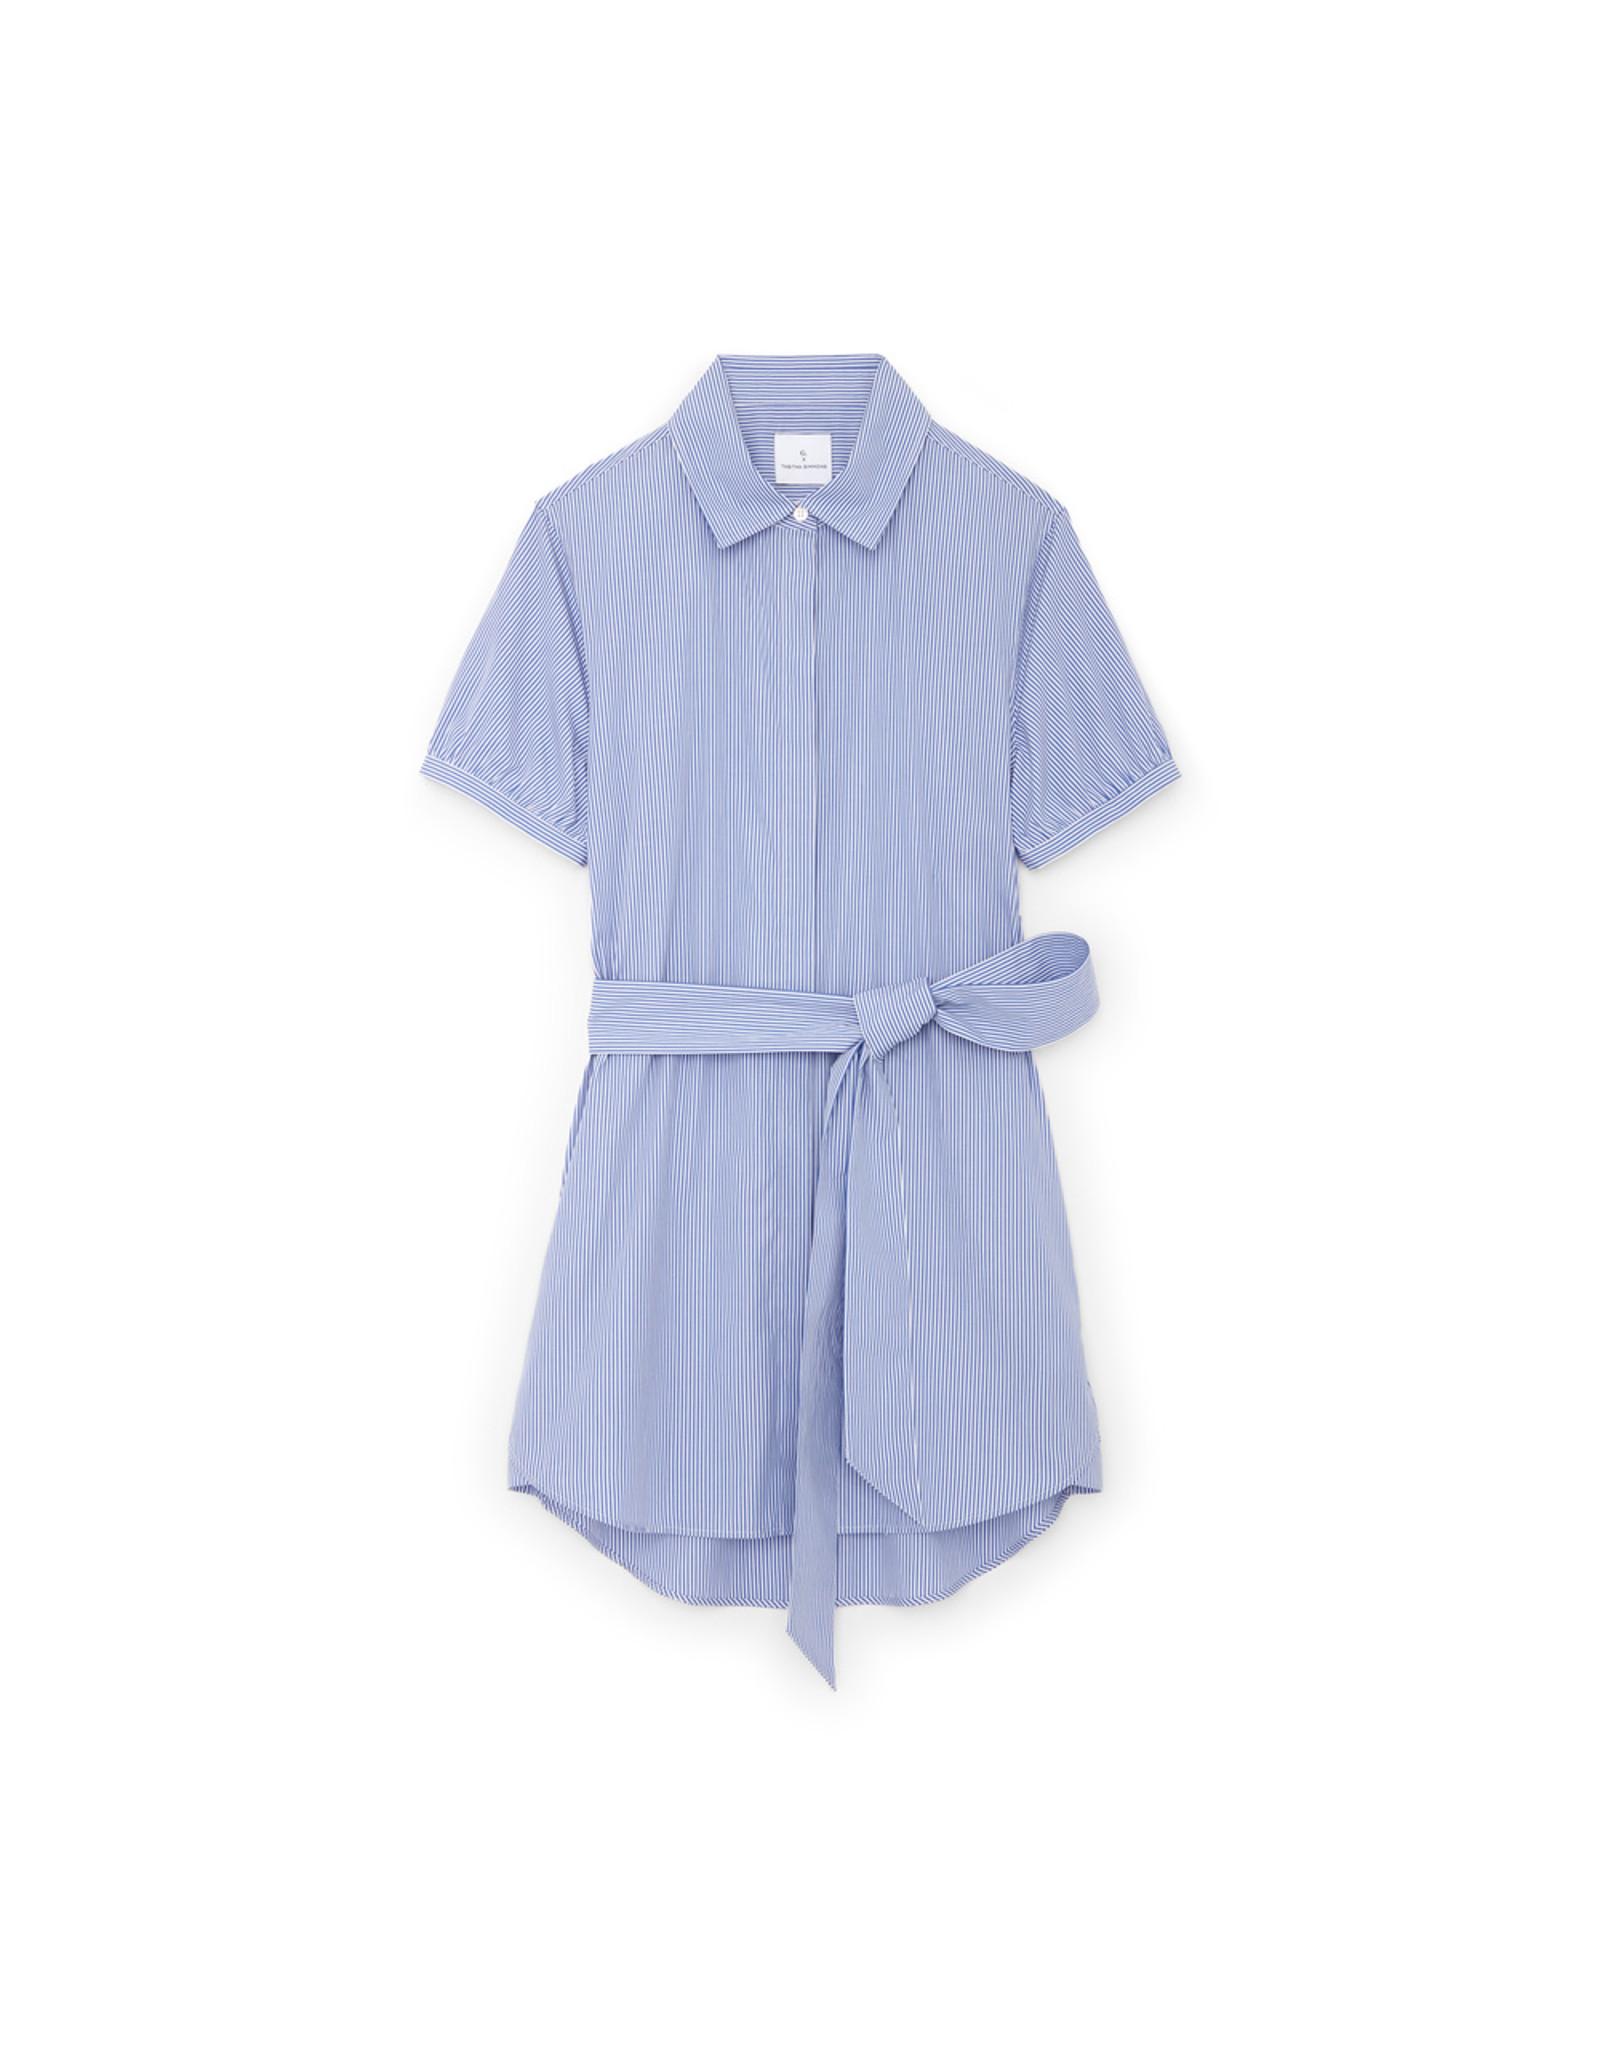 G. Label G. Label Cusco Mini Shirt Dress (color: Blue & White Stripe, Size: S)